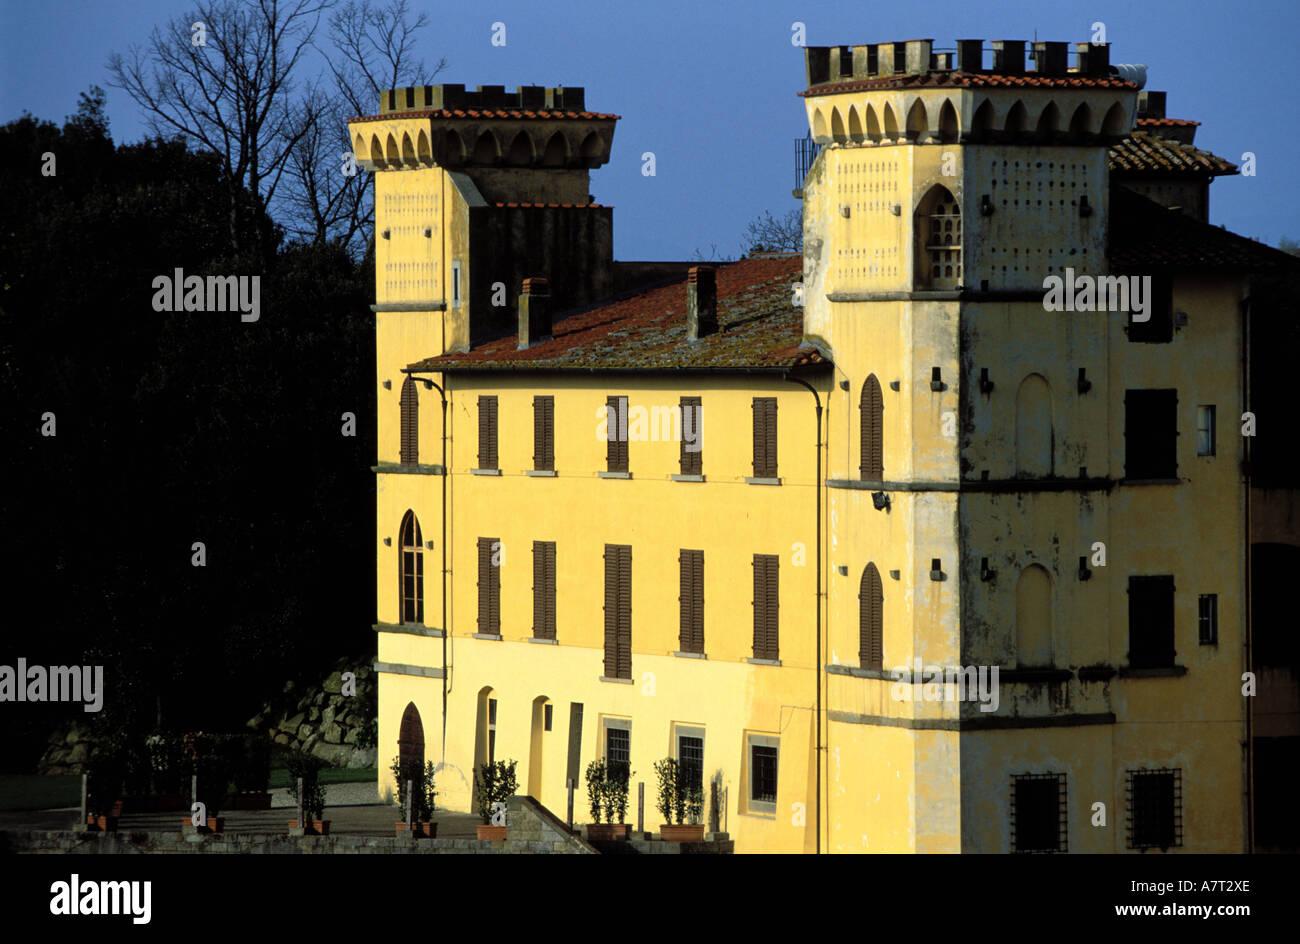 Italia, Toscana, Sant'Agata, agroturismo (granja) Villa I Bonsi en las laderas del Pratomagno Foto de stock